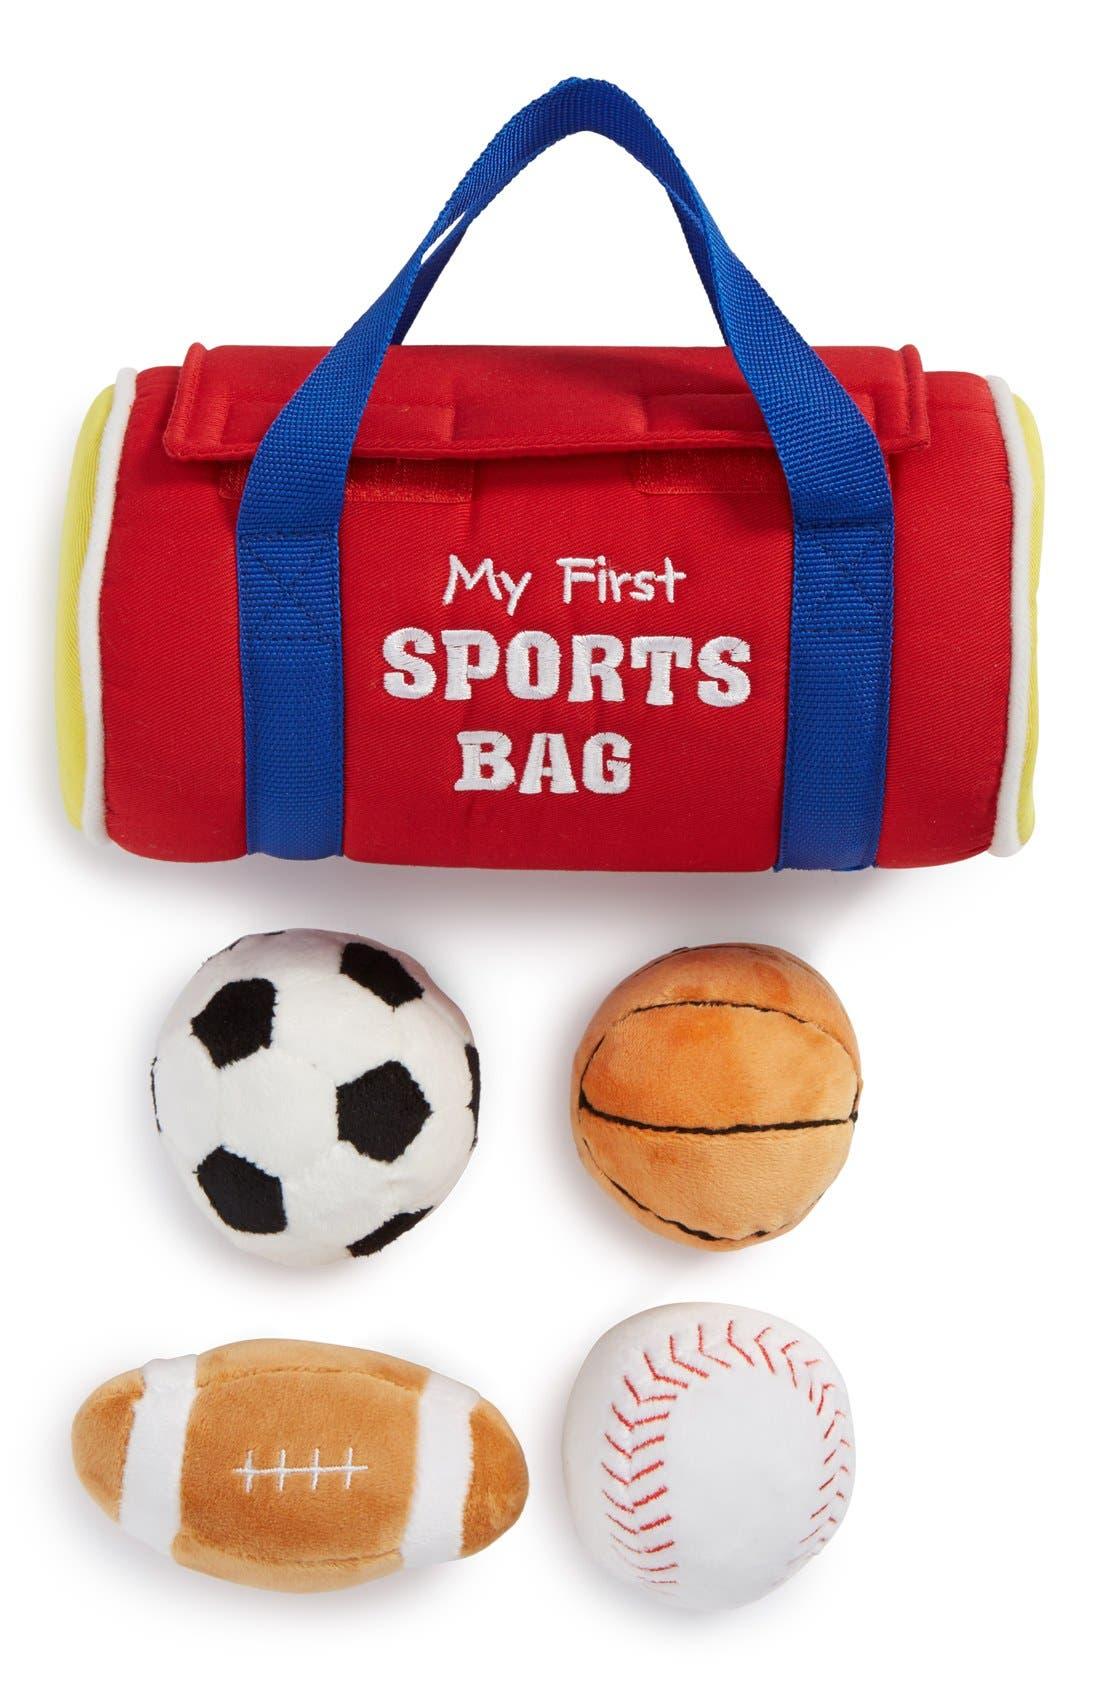 BABY GUND 'My First Sports Bag' Play Set